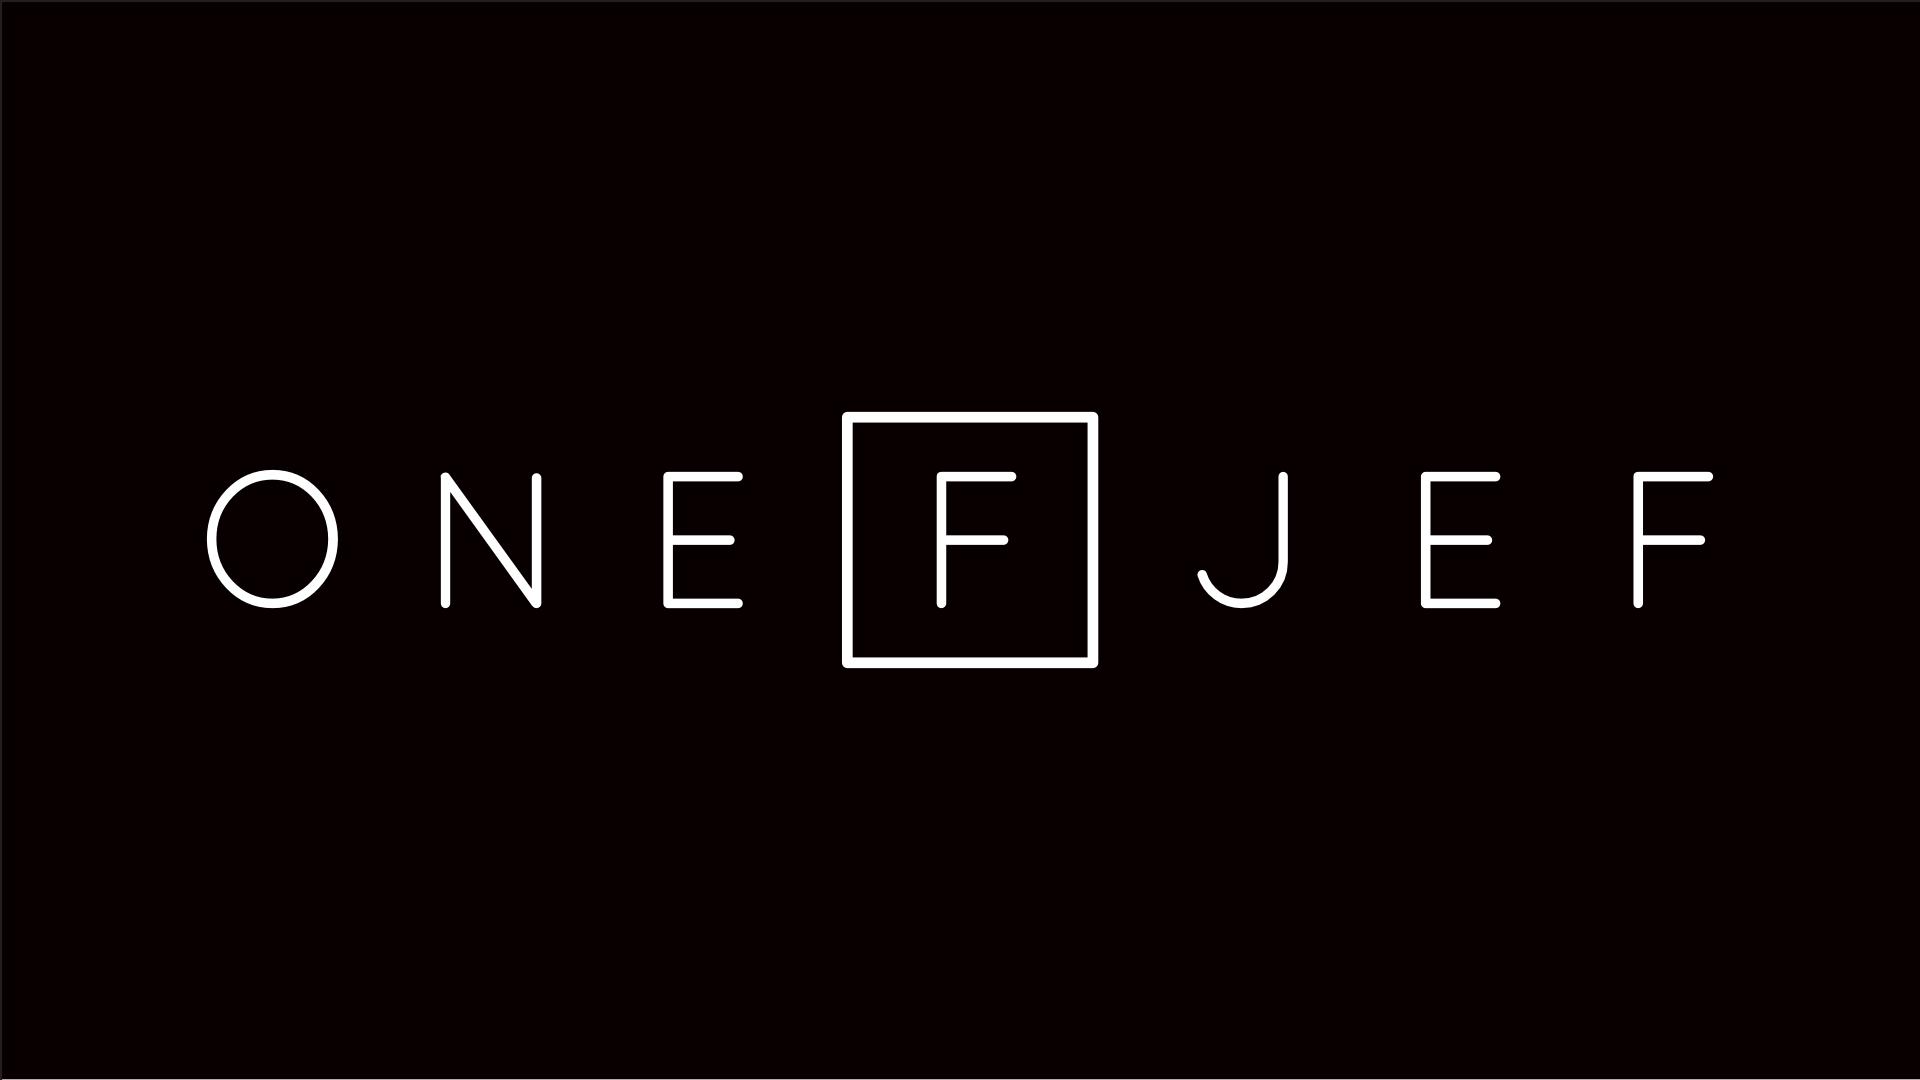 One F Jef logo